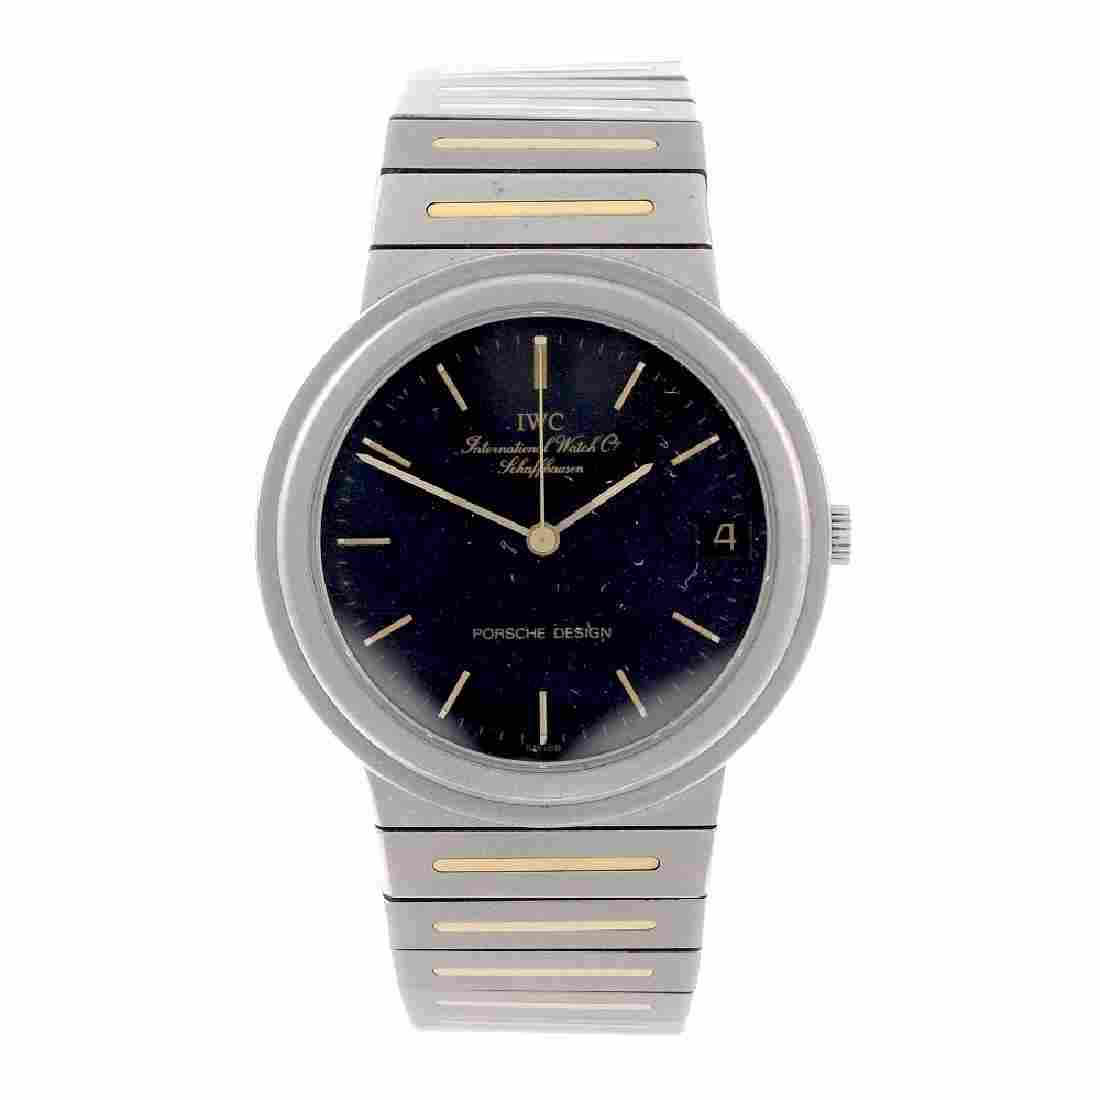 IWC - a mid-size Porsche Design bracelet watch.